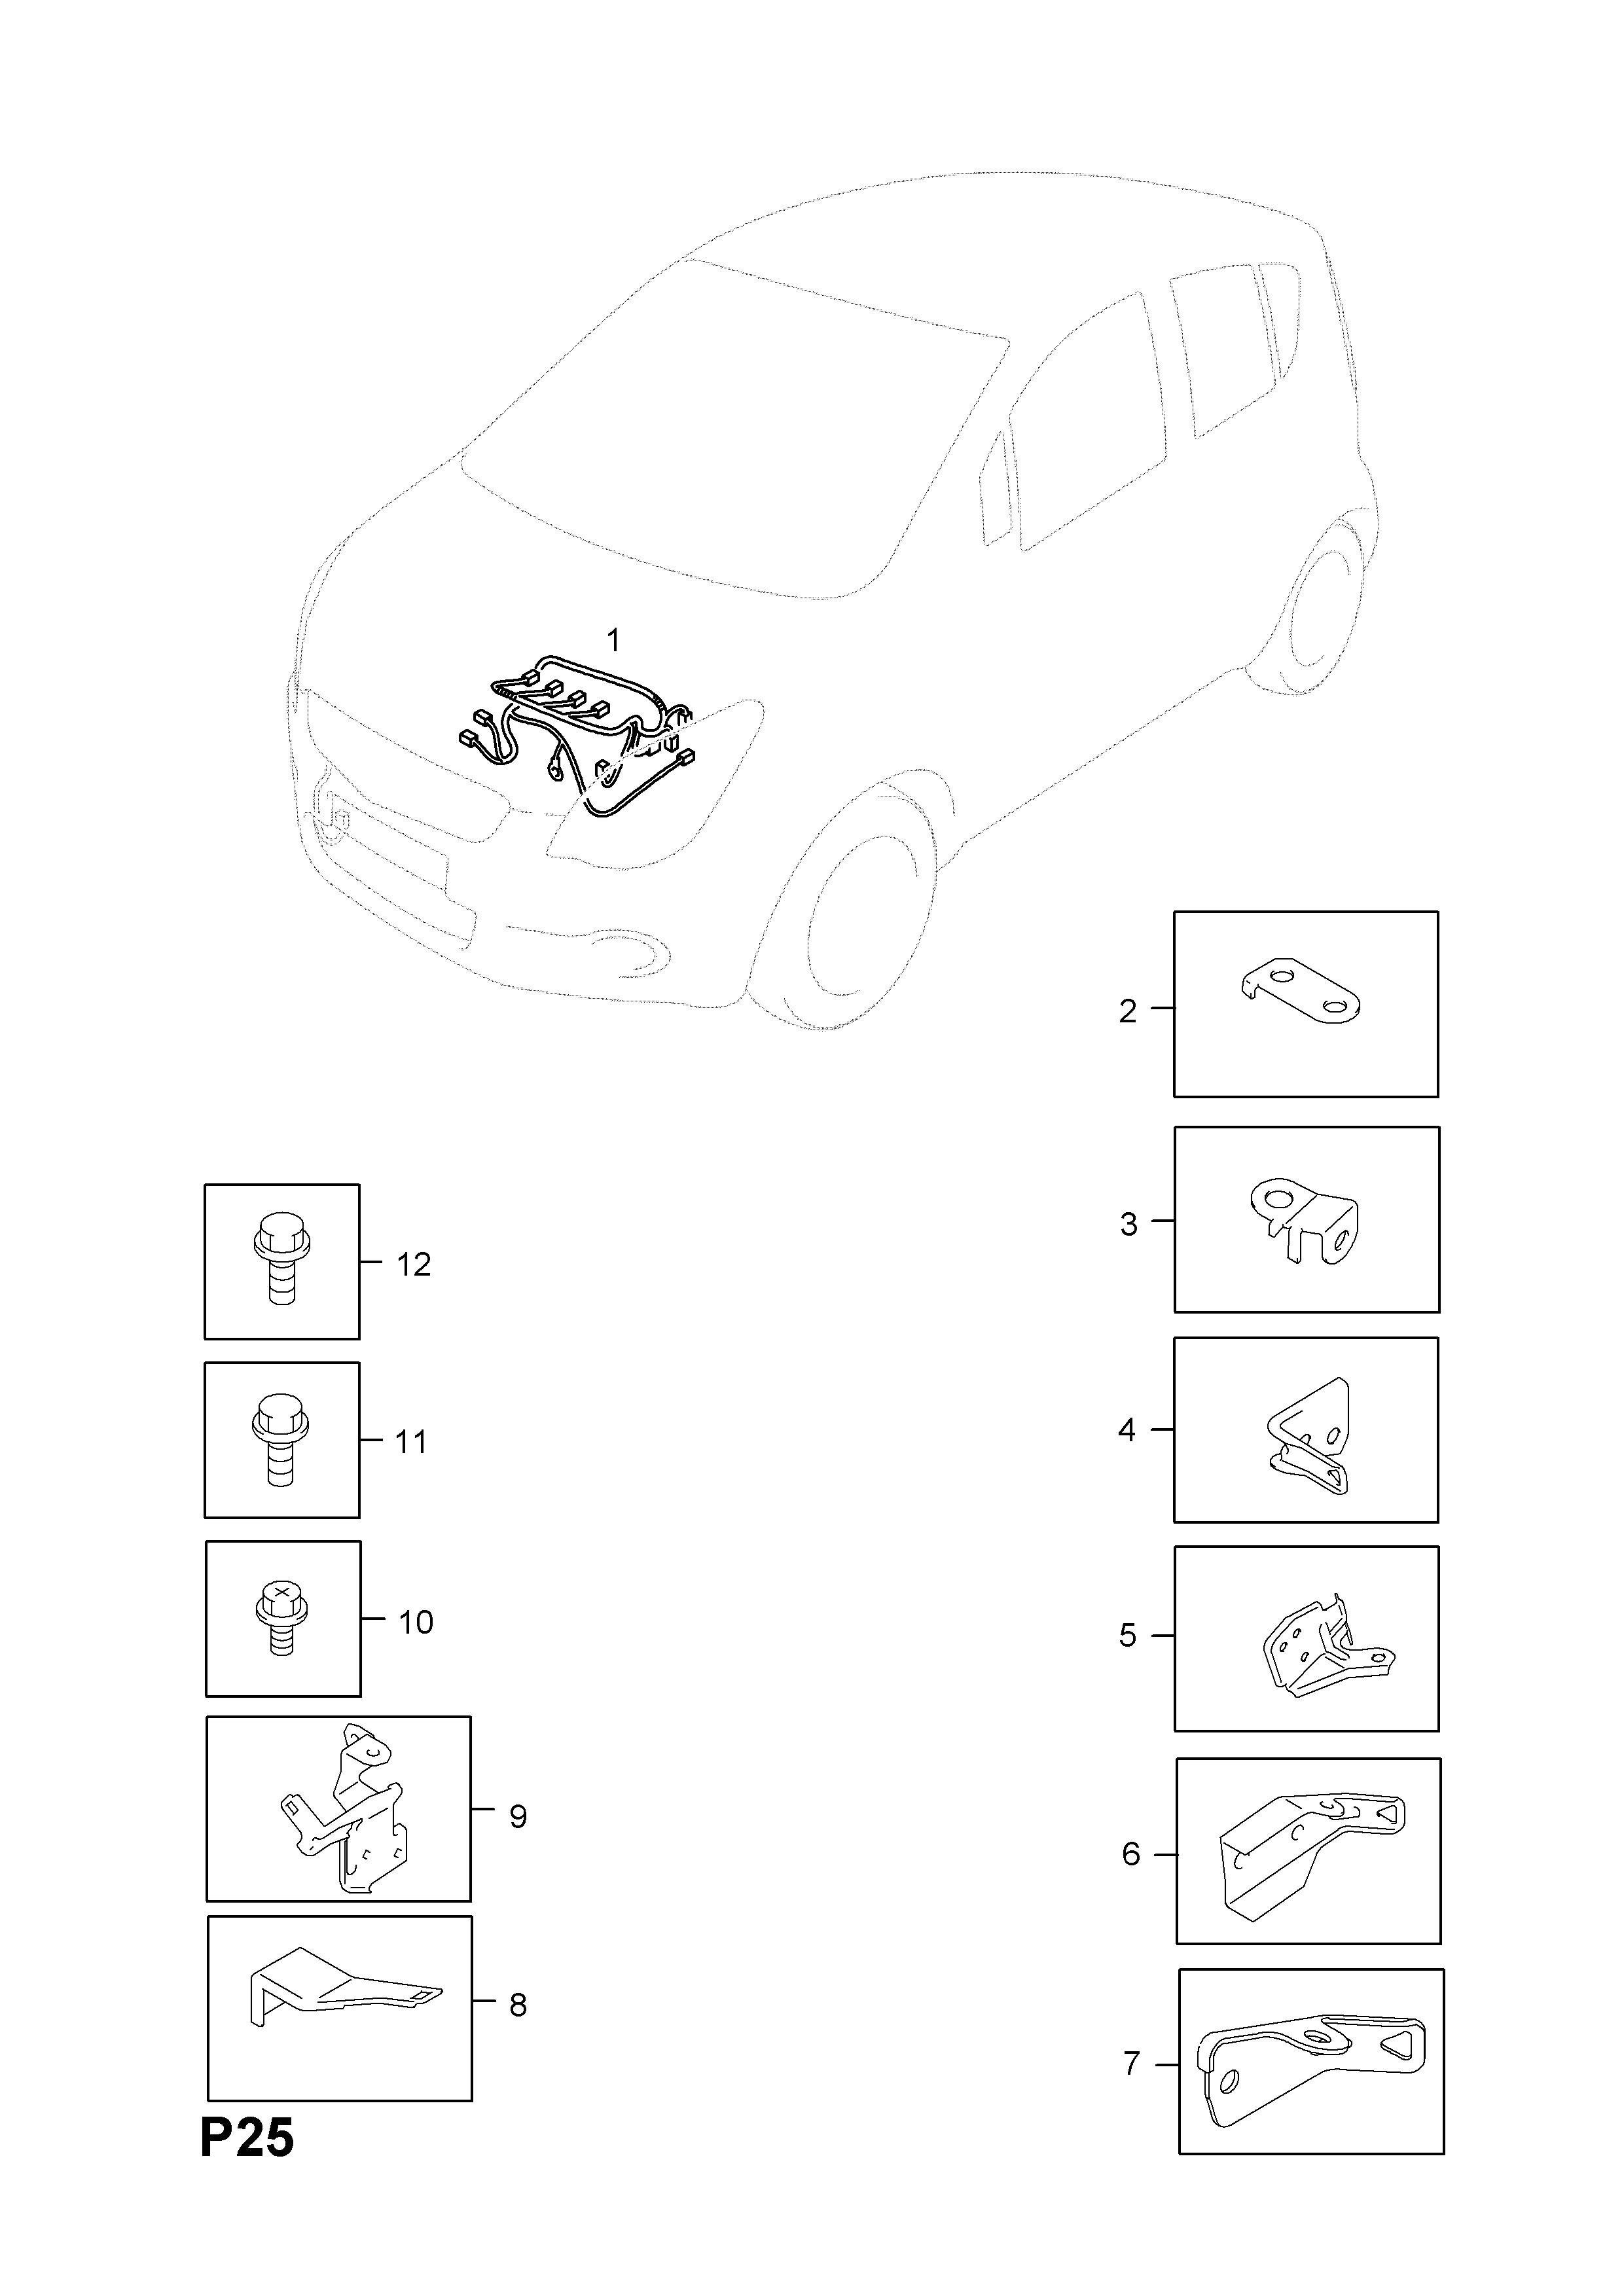 Opel AGILA-B ( 2008 - ), P ELECTRICAL, 9 WIRING HARNESS, 7.K10B,K12B on